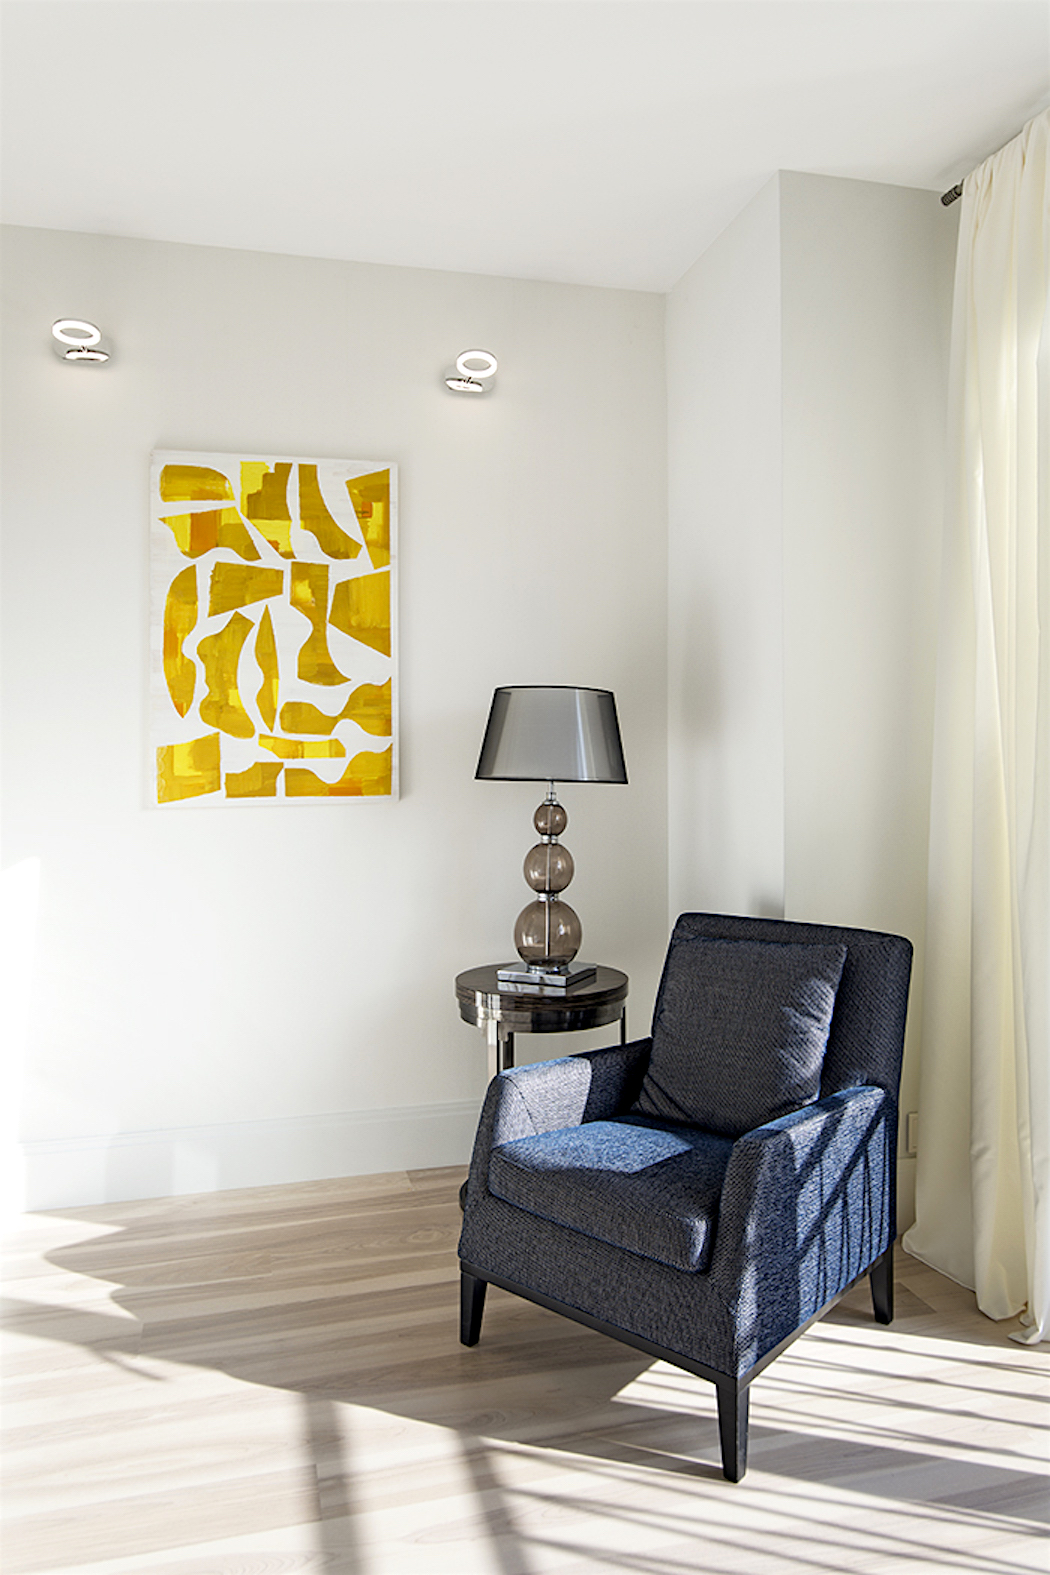 04-dominika rostocka apartament.jpg